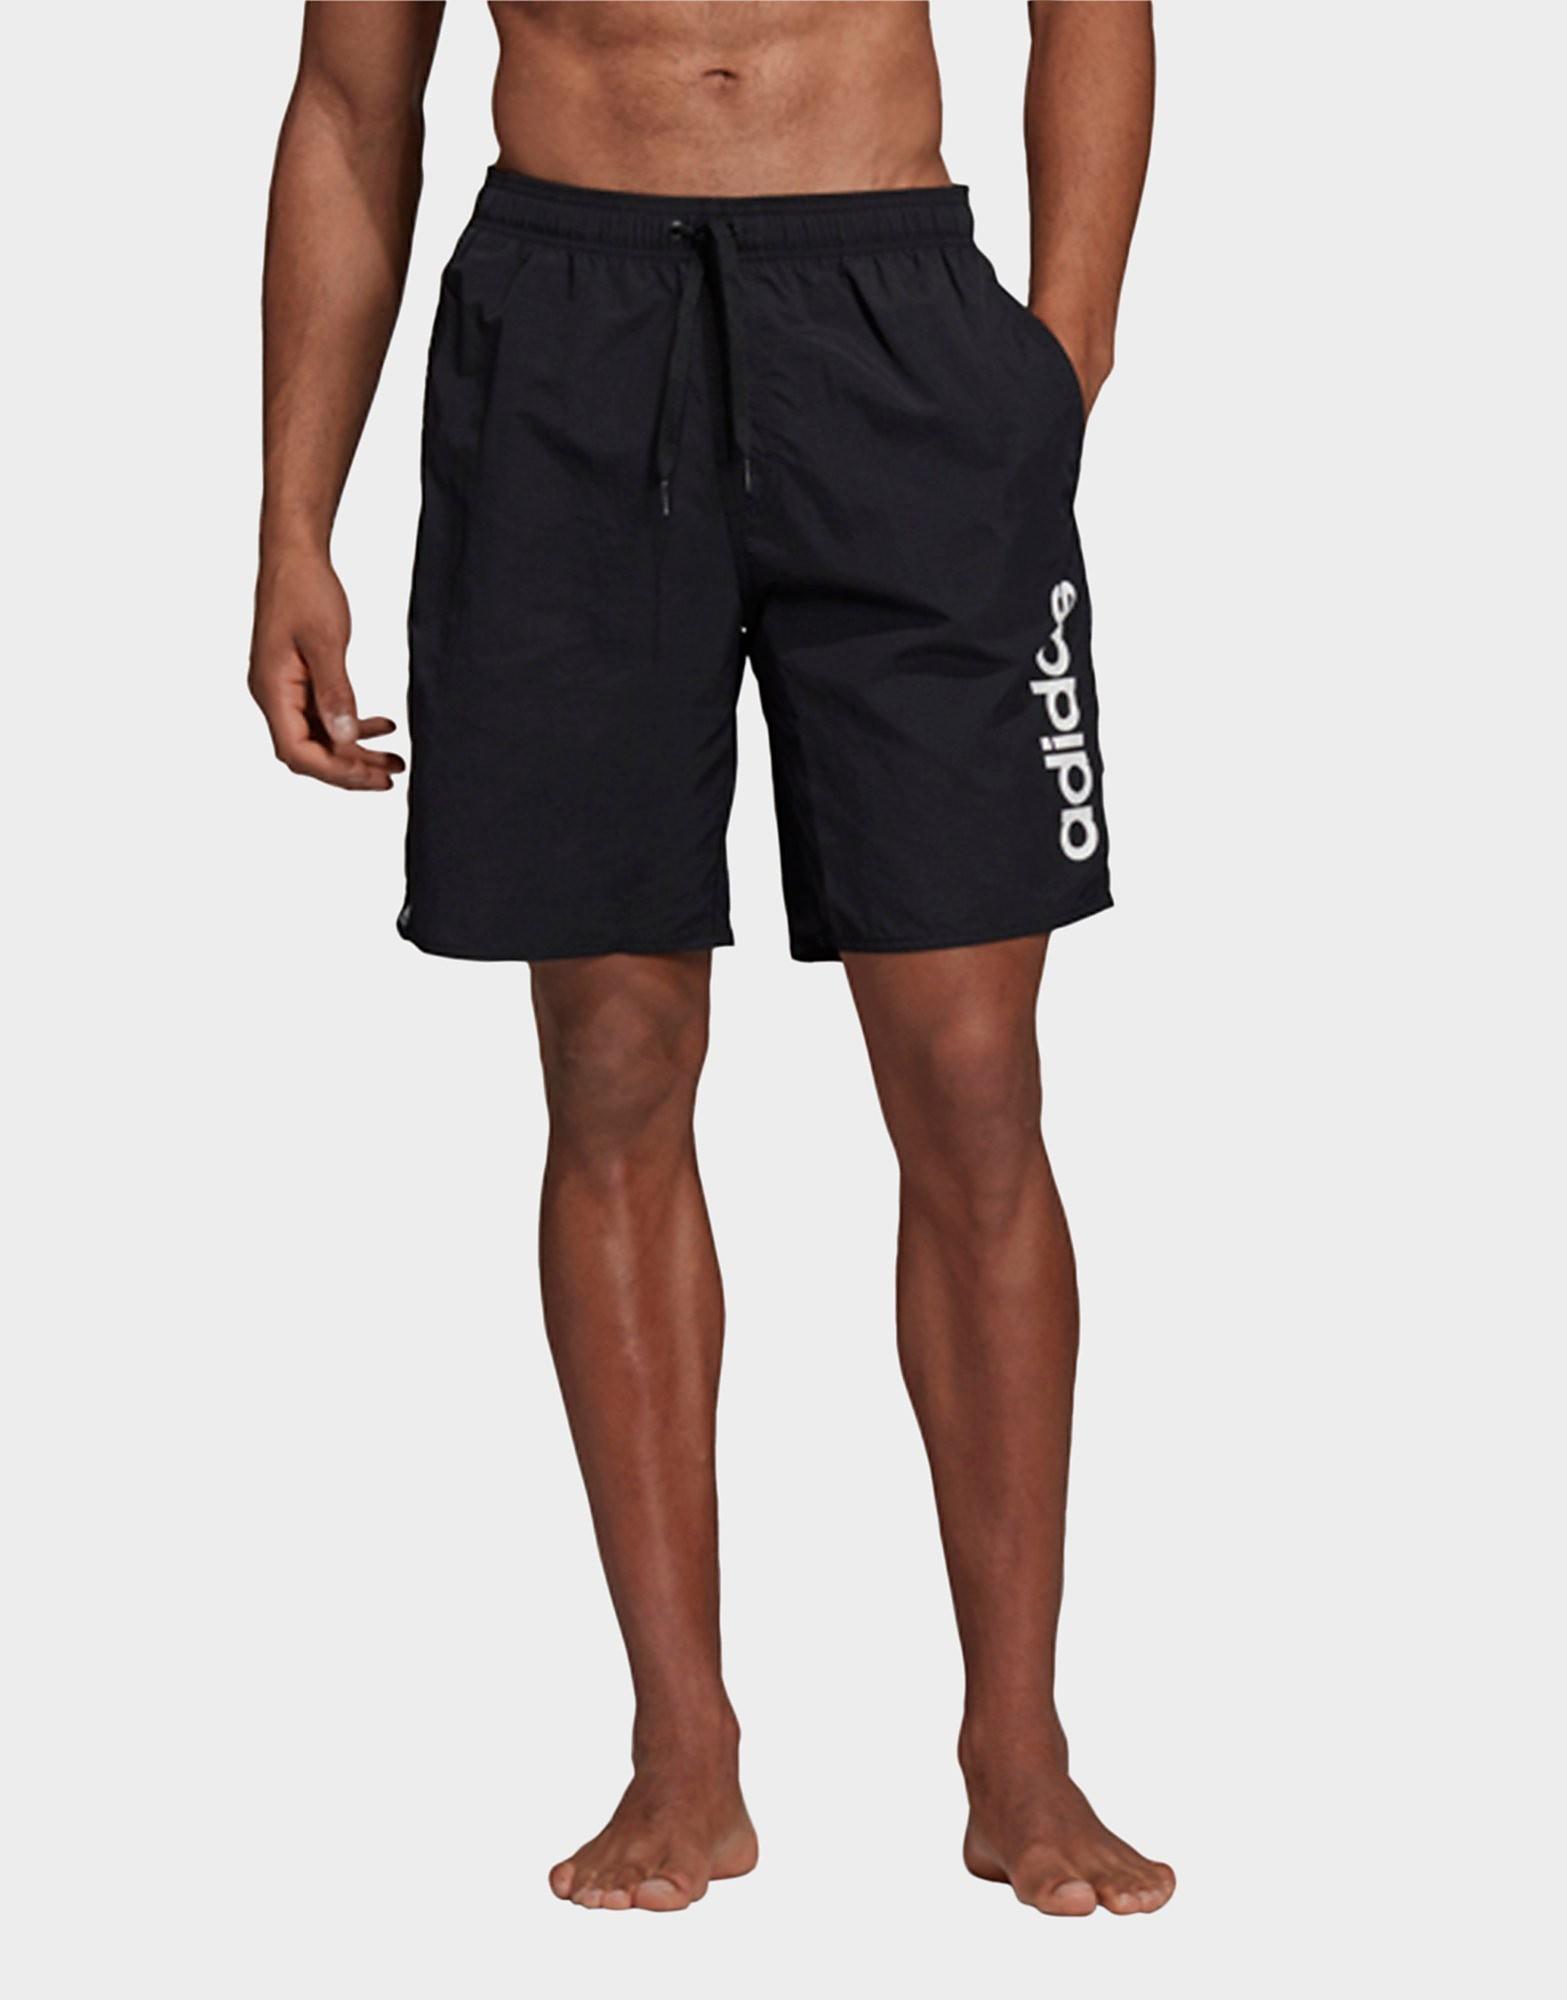 ADIDAS Lineage Swim Shorts